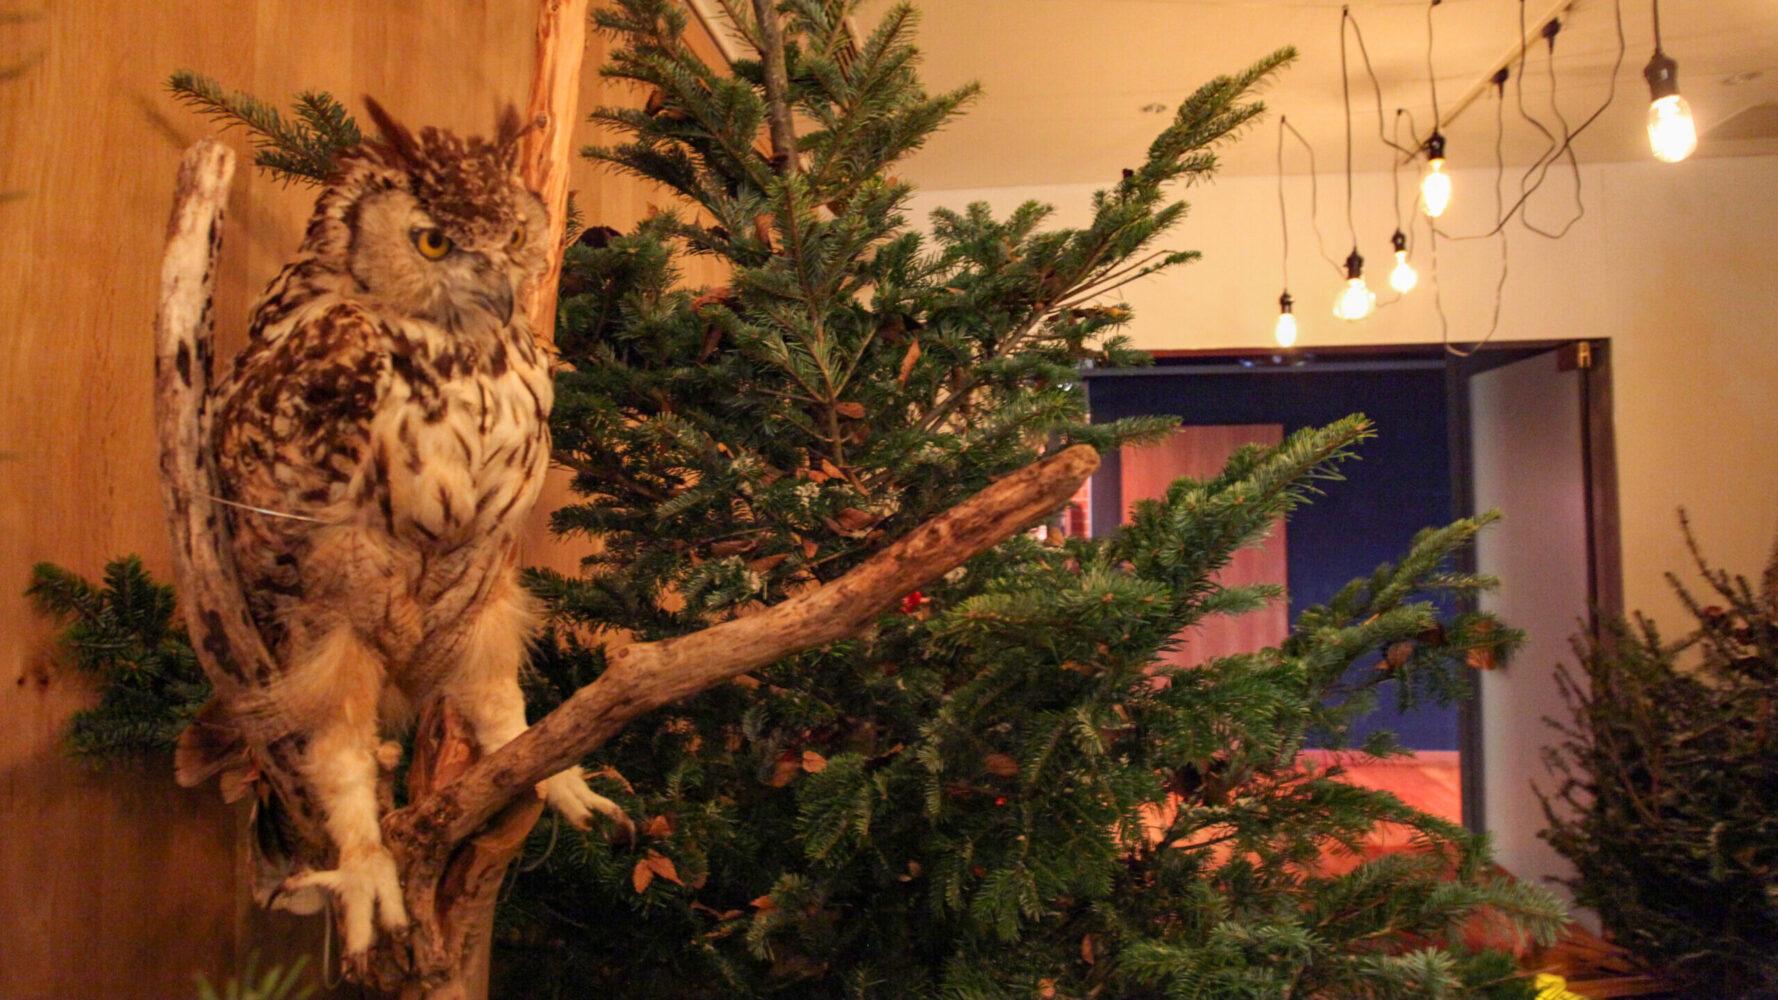 (marunouchi) HOUSE Christmas display 事例画像6